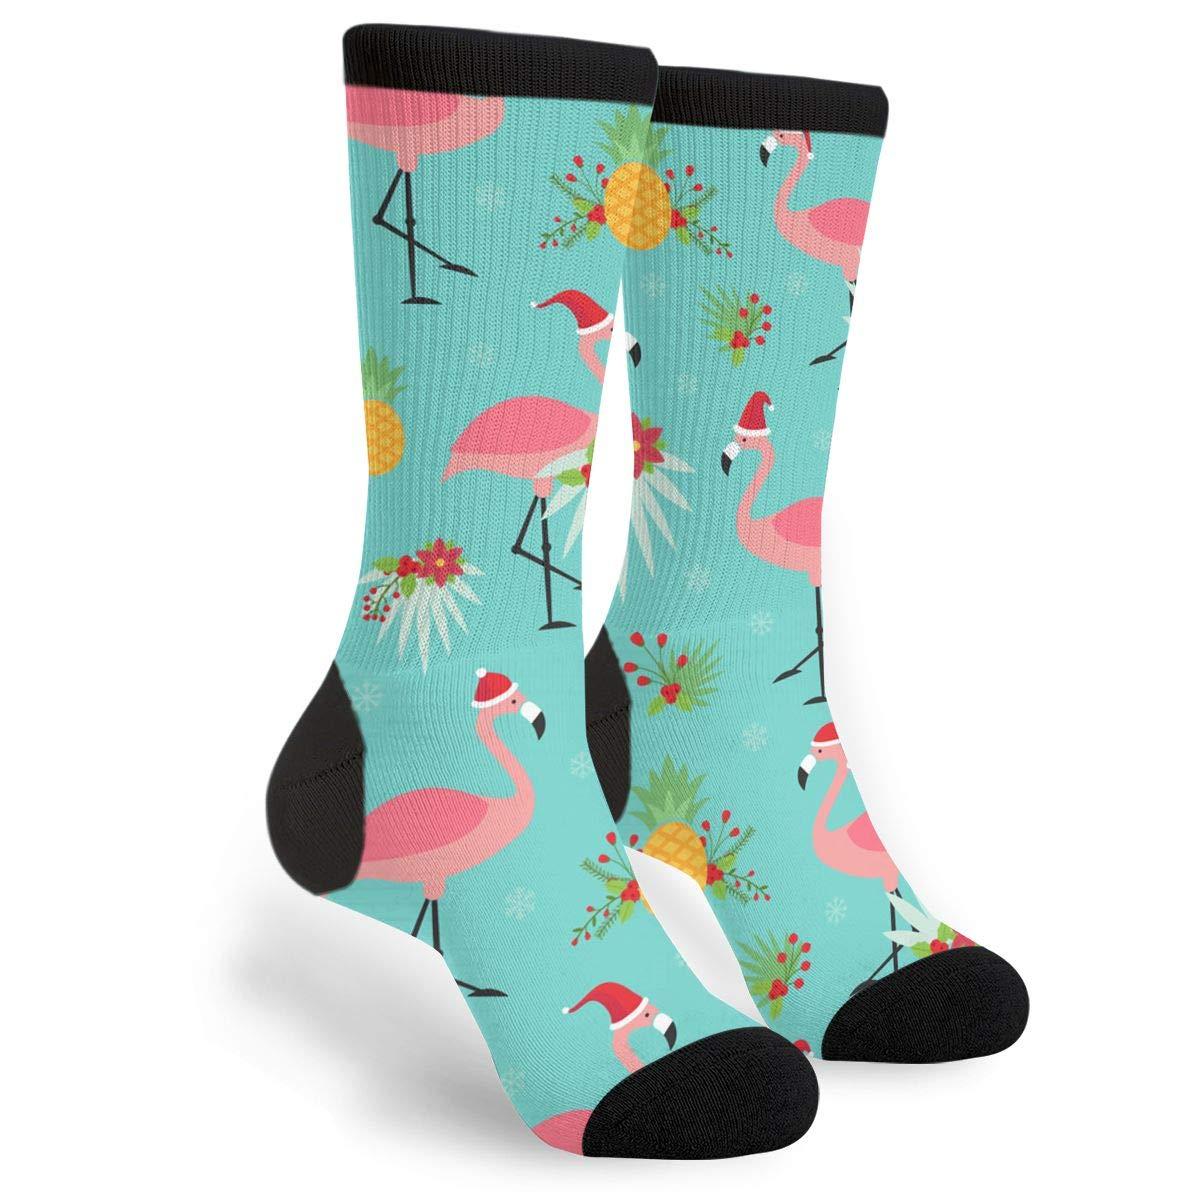 Gifts Tropical Christmas Flamingo Santas Novelty Socks For Women /& Men One Size